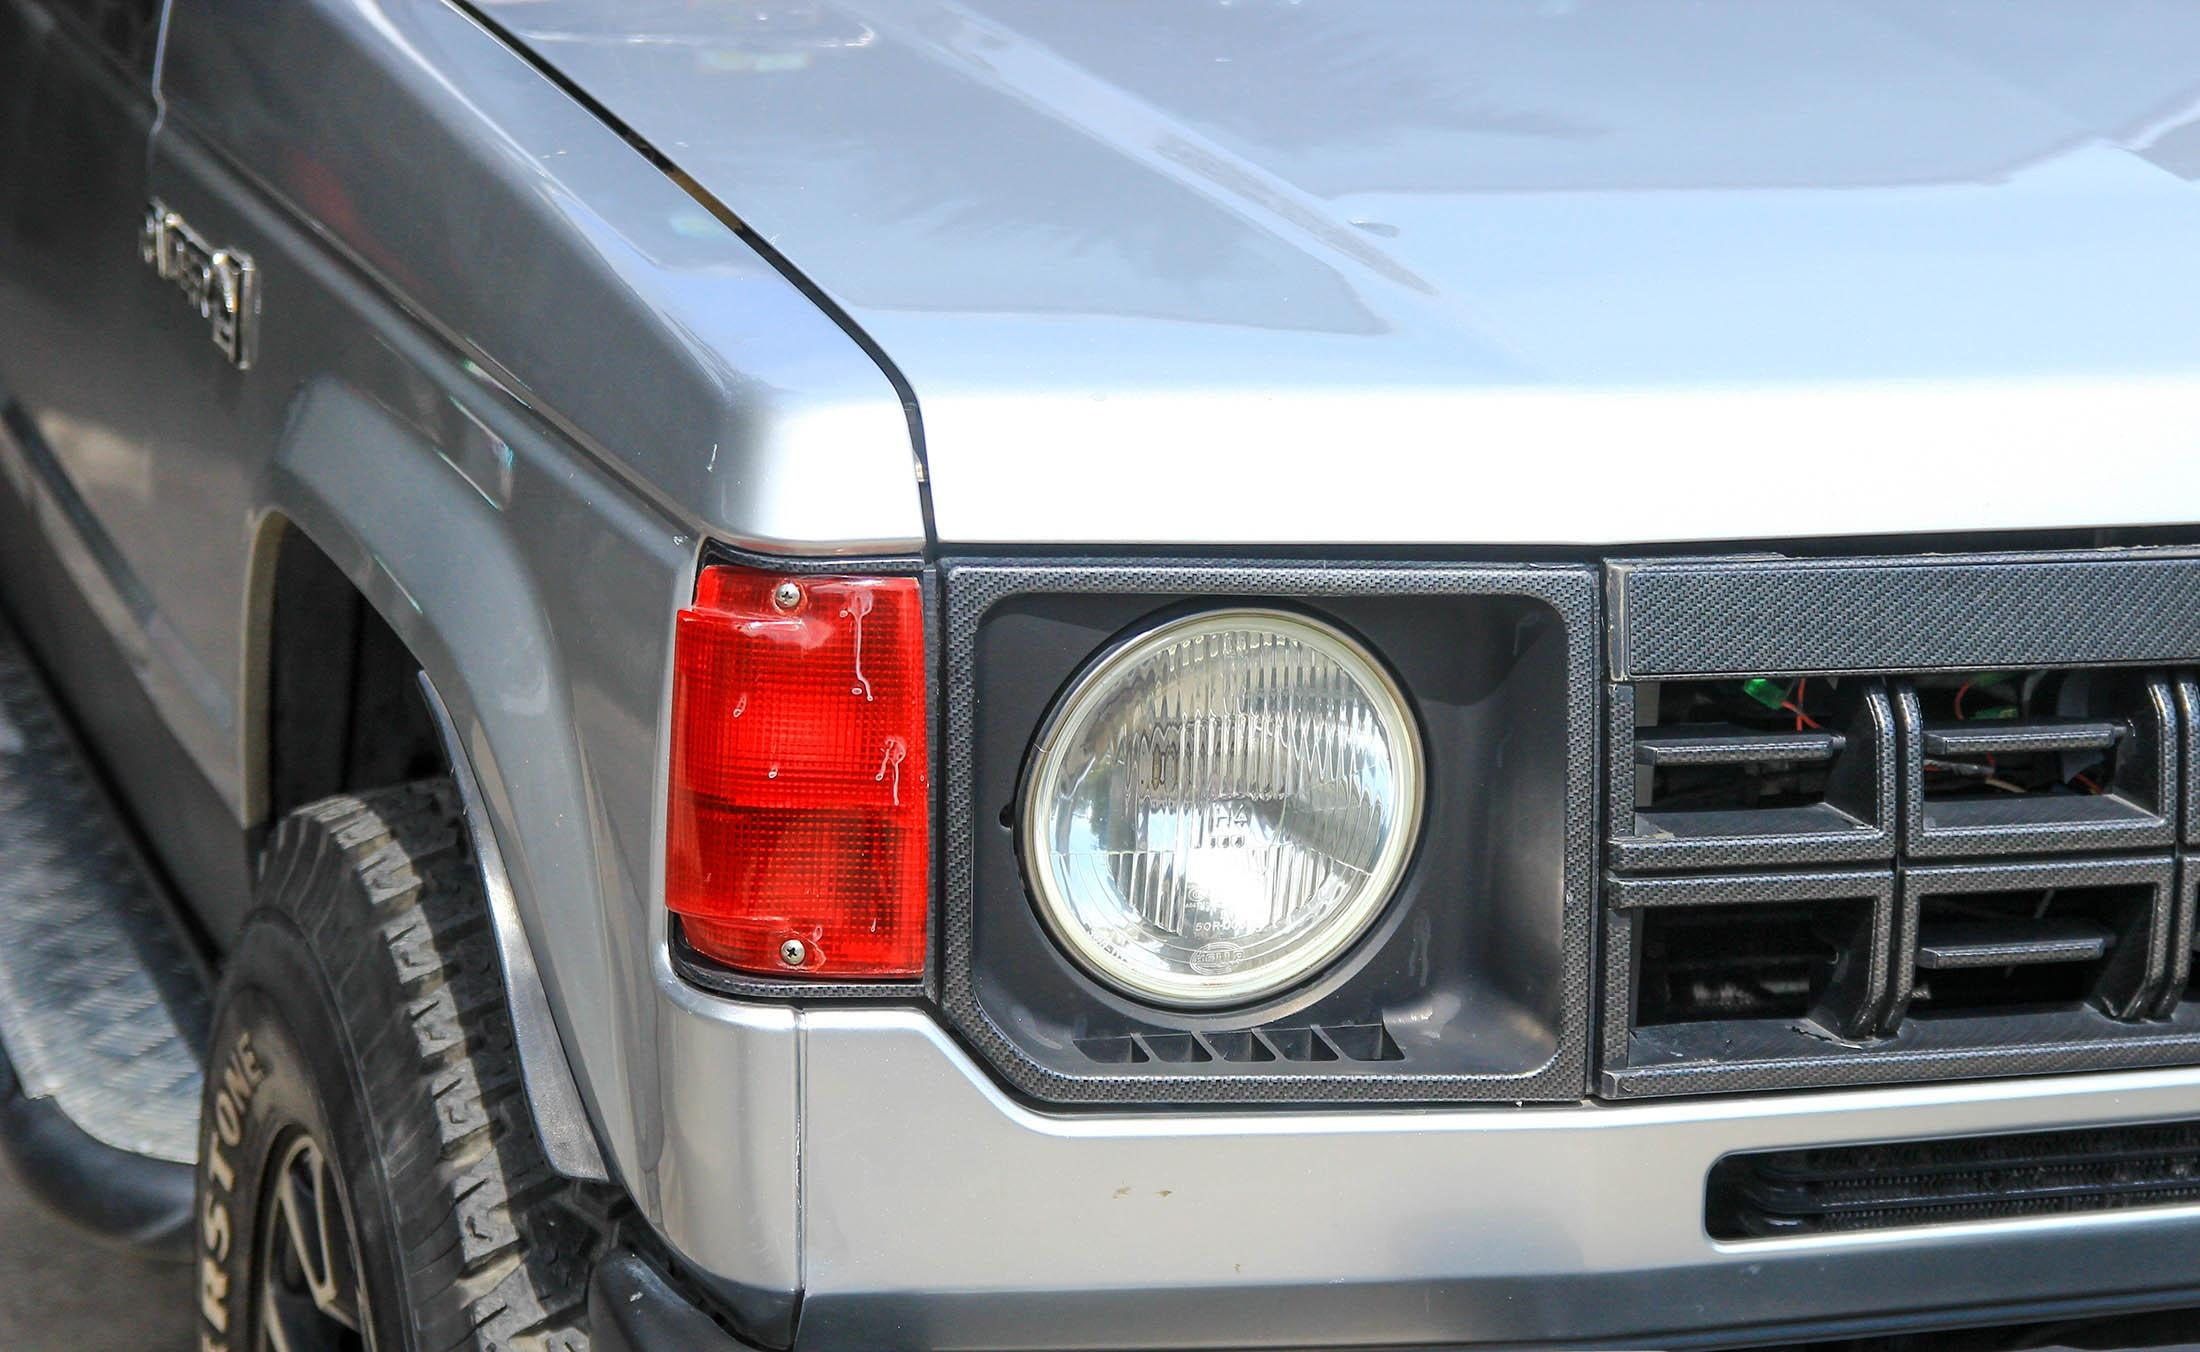 Chi tiết Dodge Raider - xe cổ hiếm gặp tại Việt Nam Ảnh 3